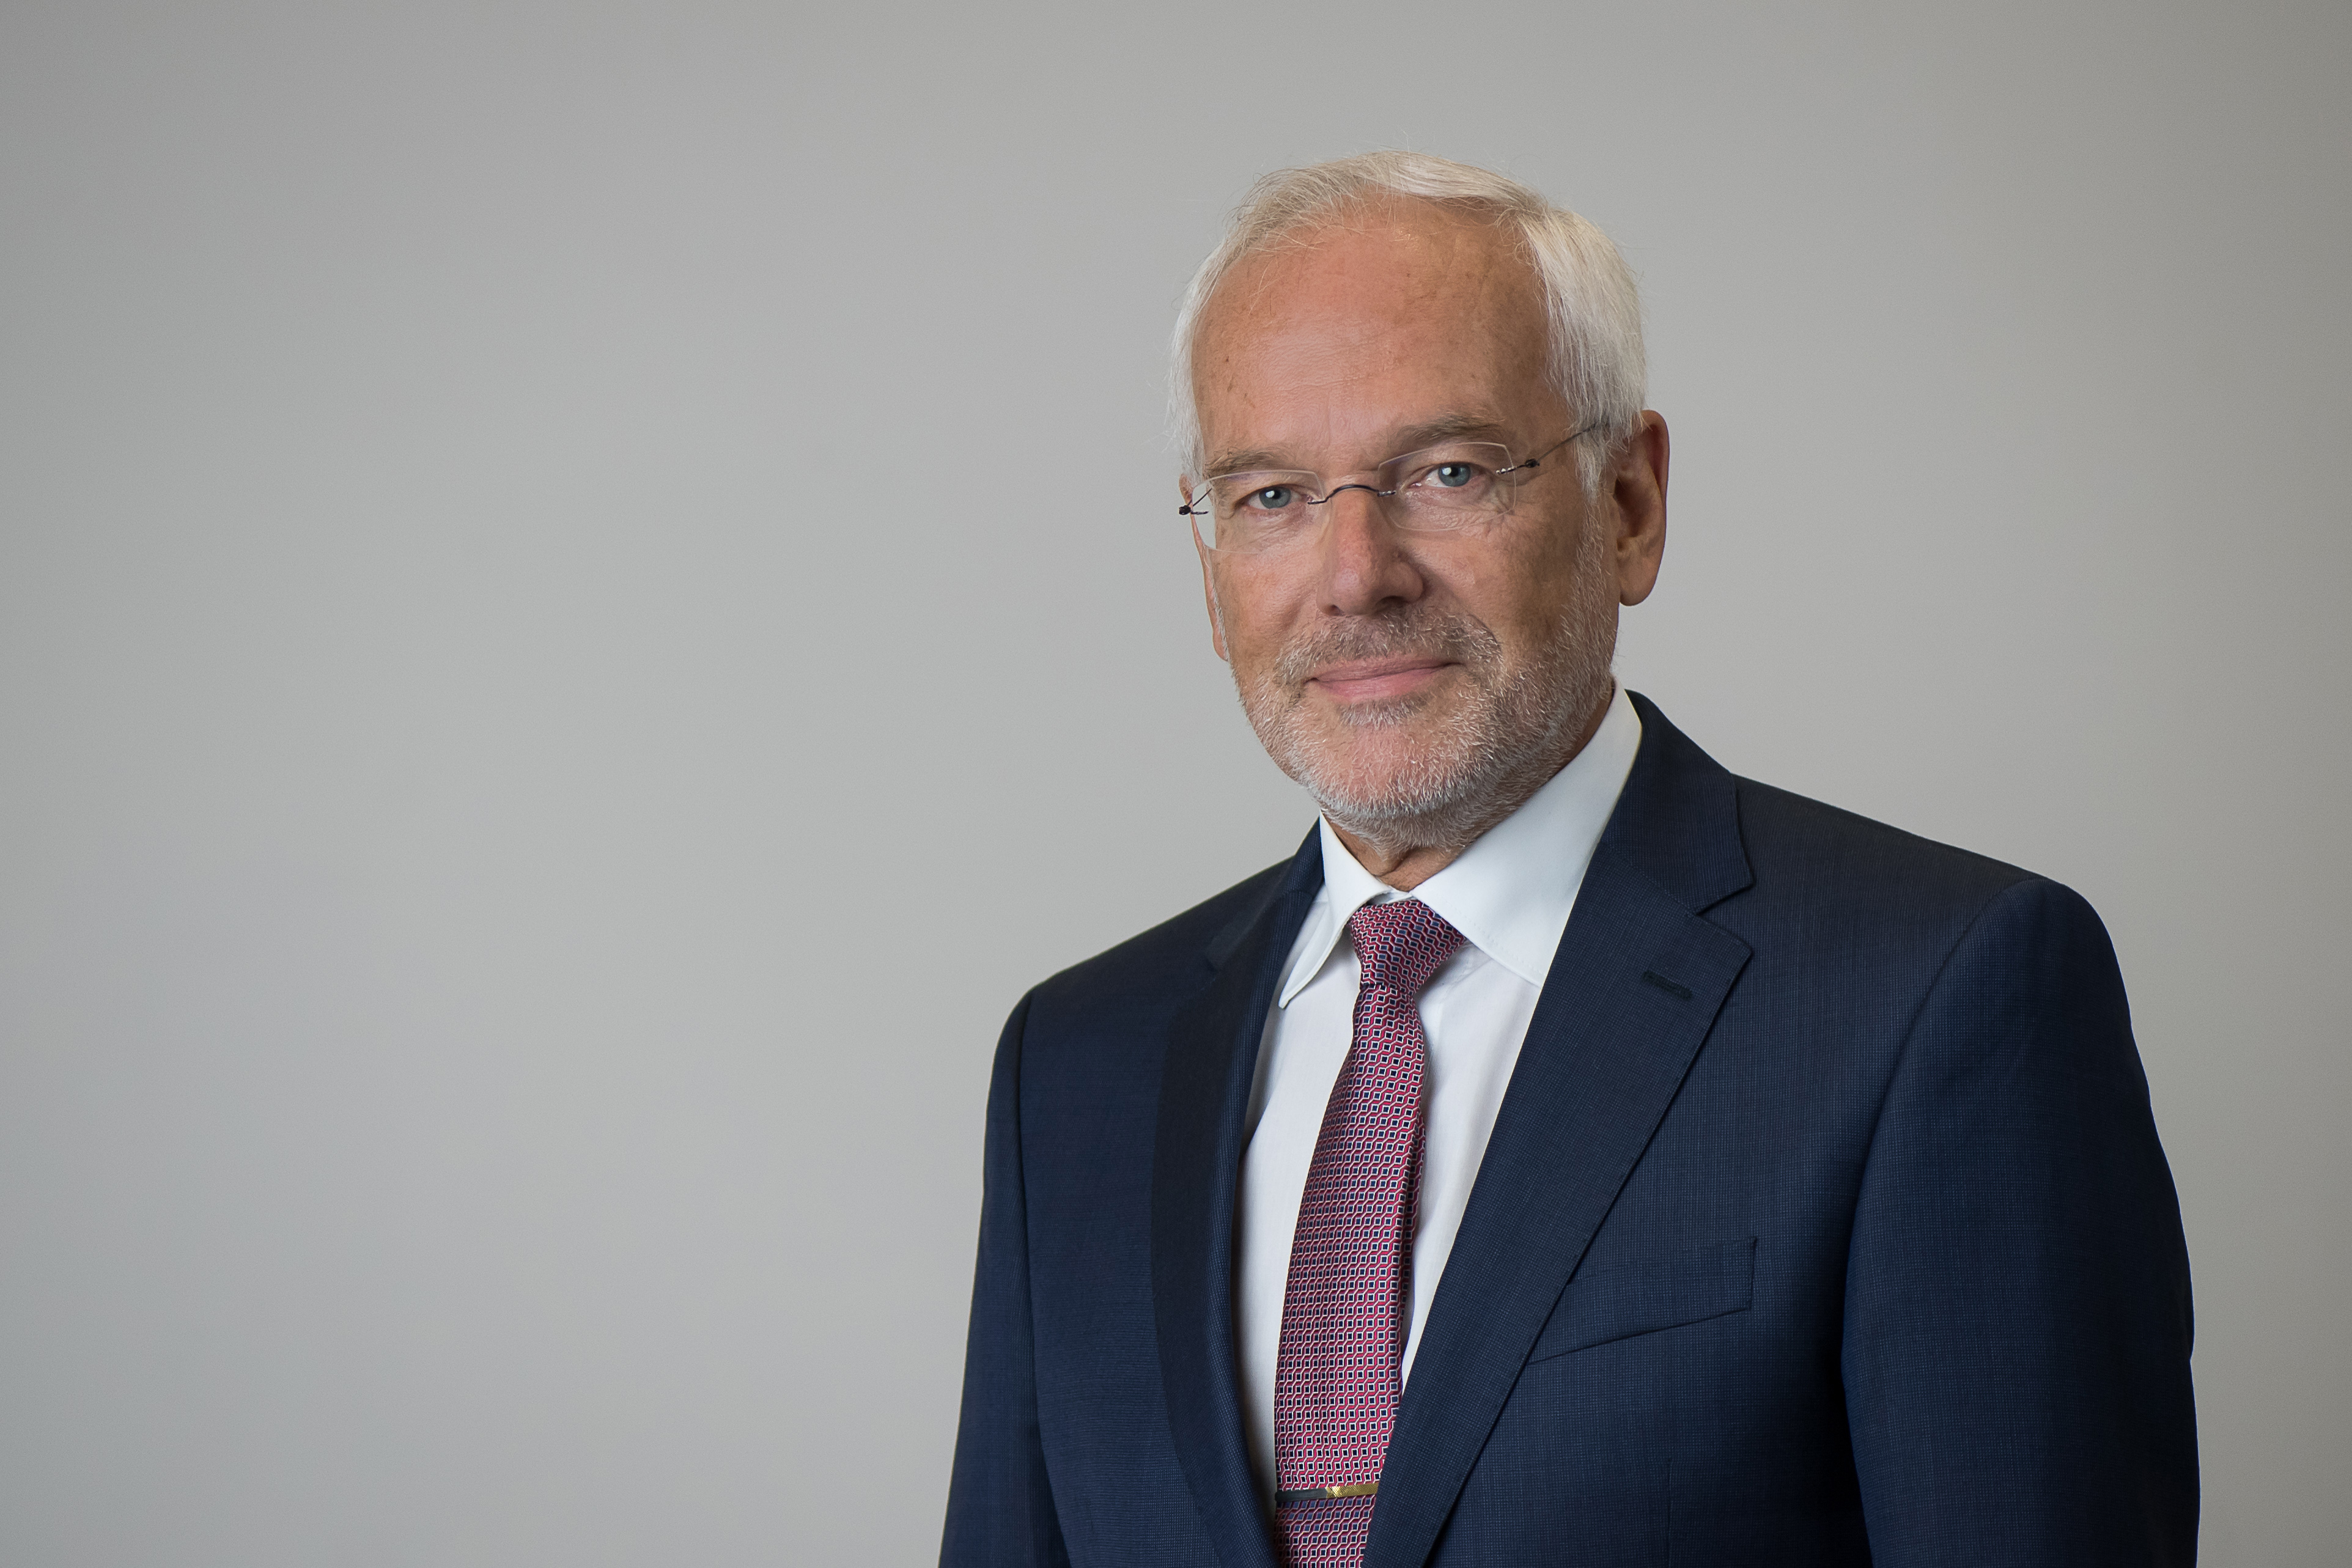 Prof. Dr. Michael Braun